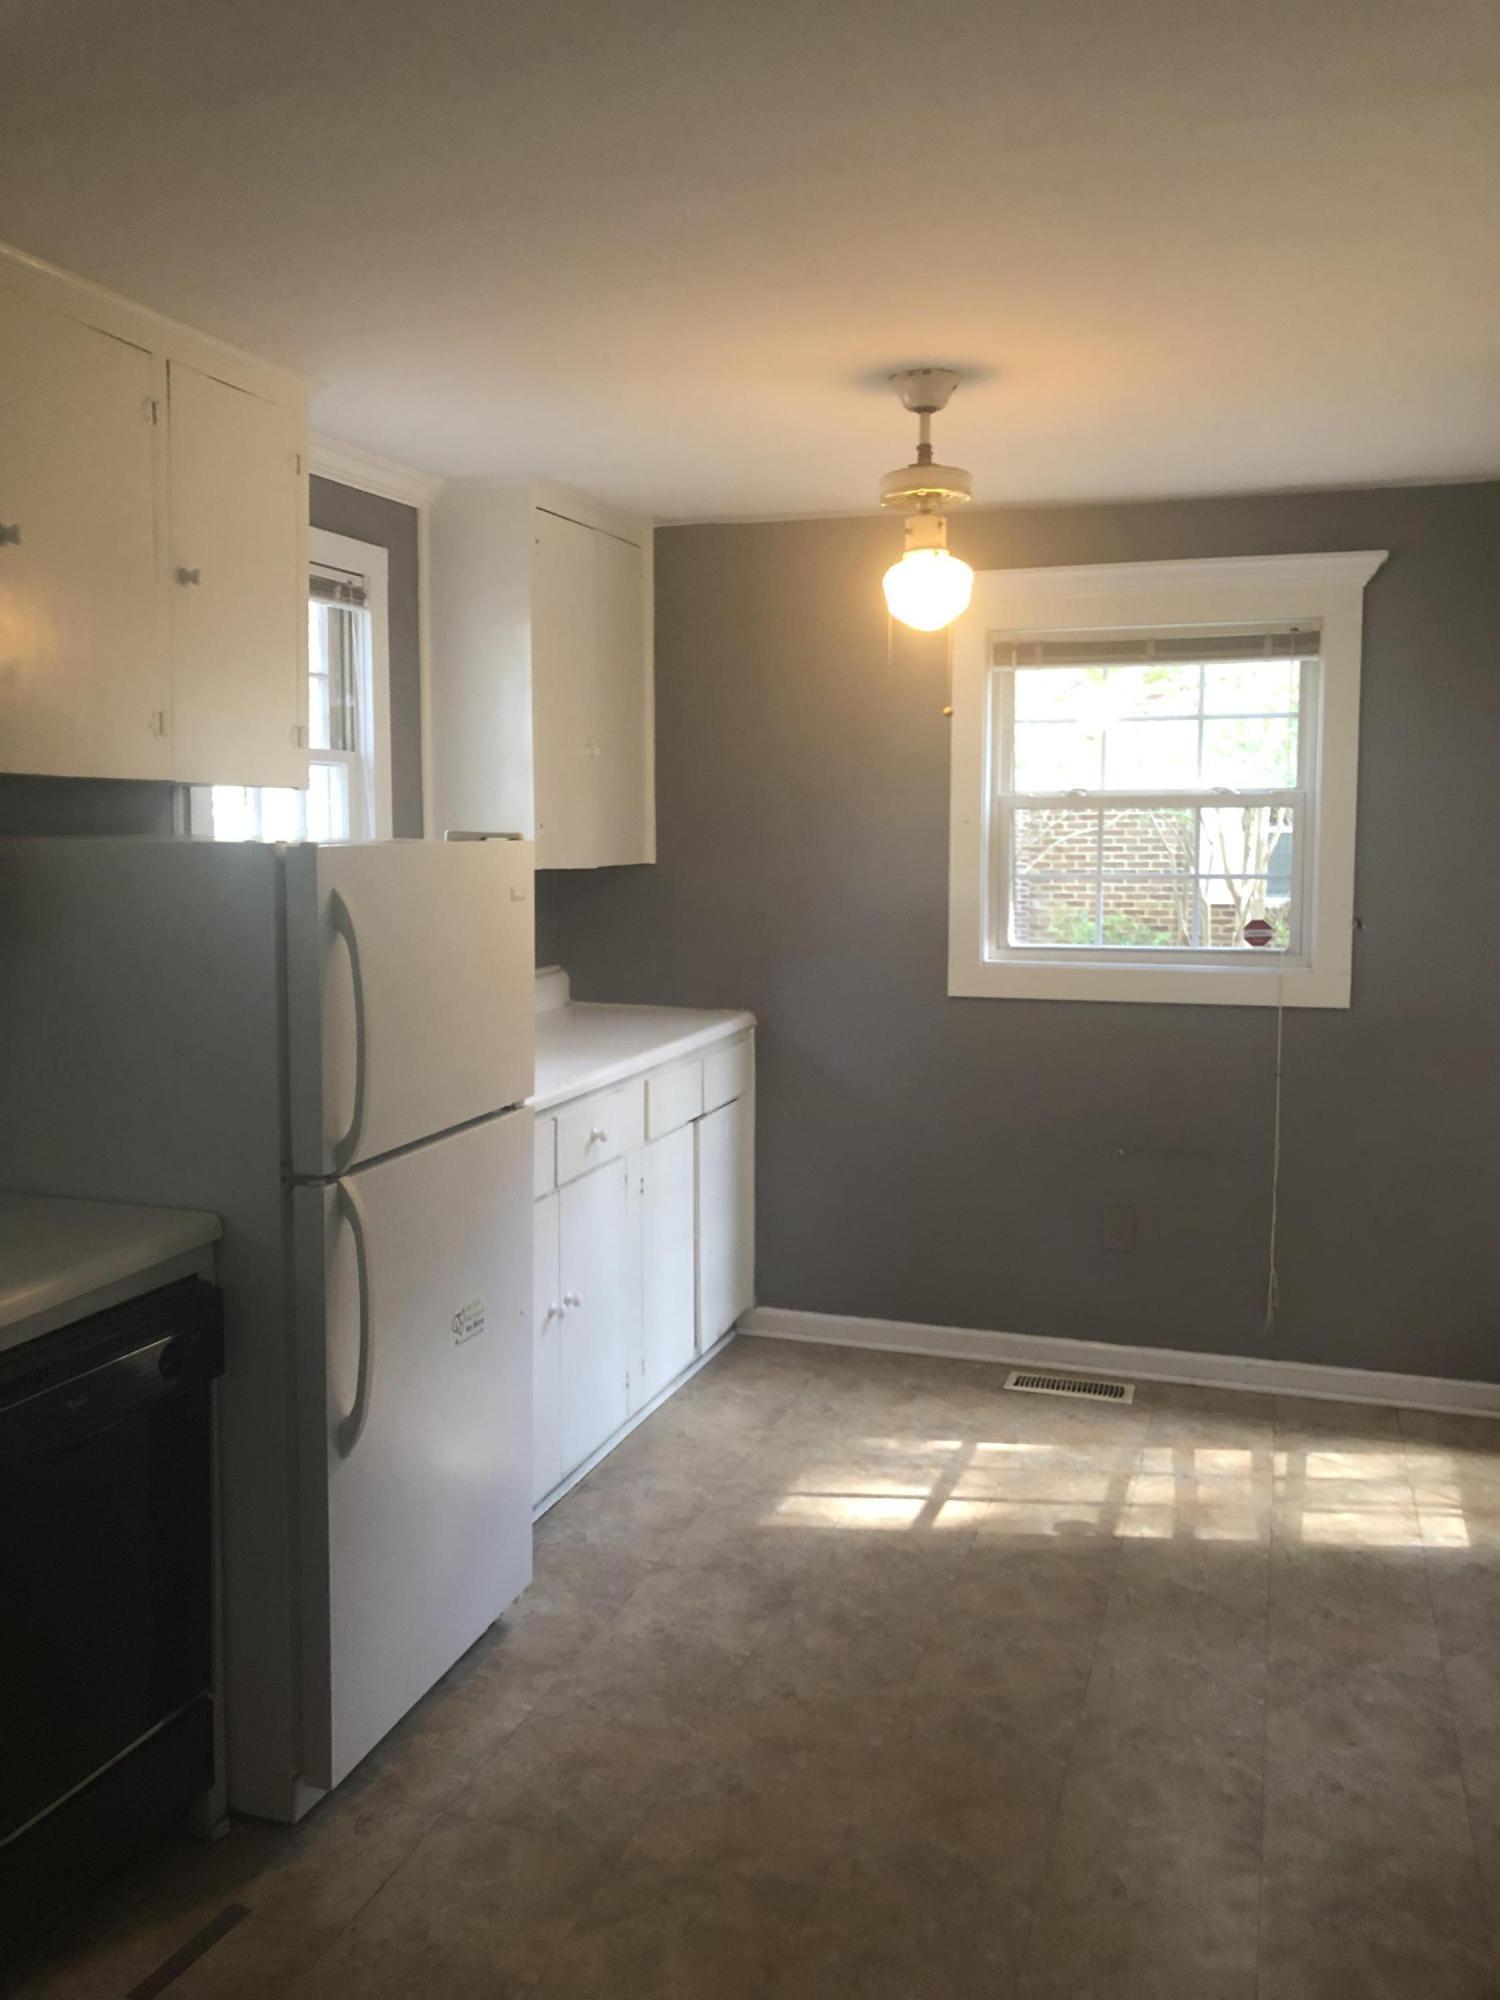 Old Mt Pleasant Homes For Sale - 733 Adluh, Mount Pleasant, SC - 2